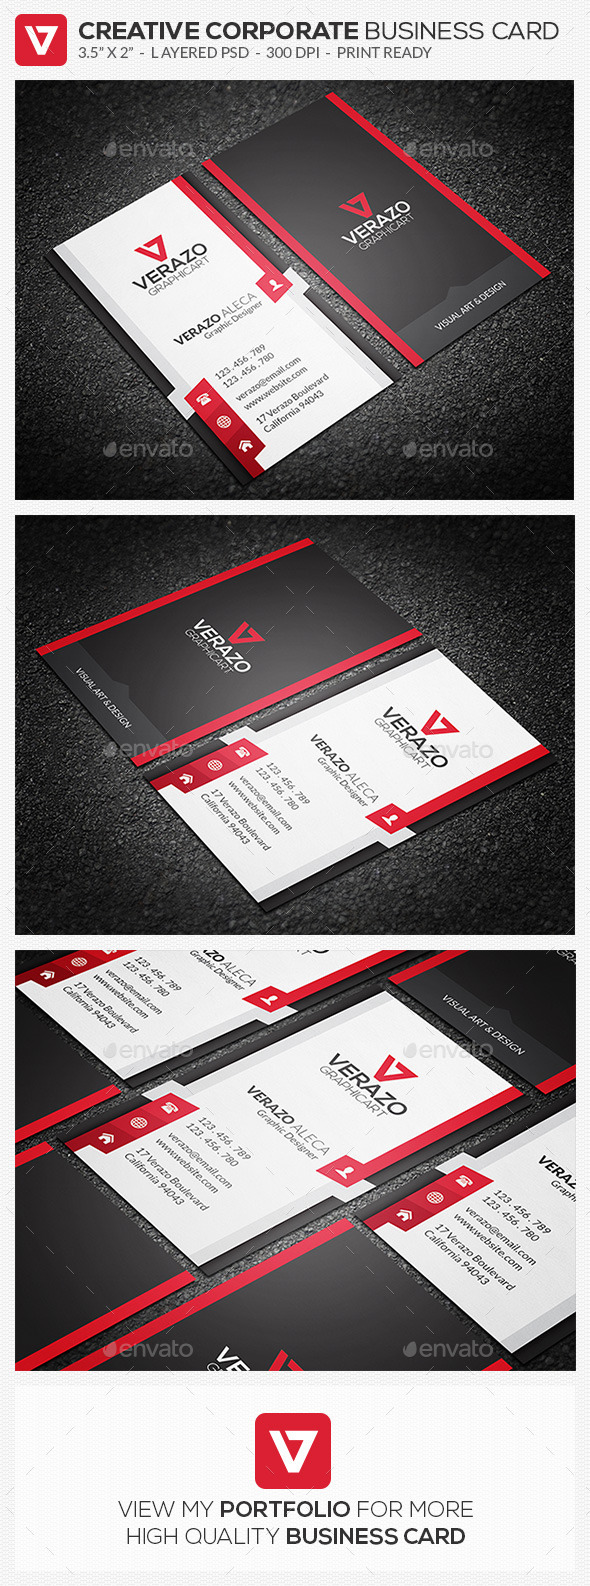 Creative Corporate Business Card 73 - Corporate Business Cards